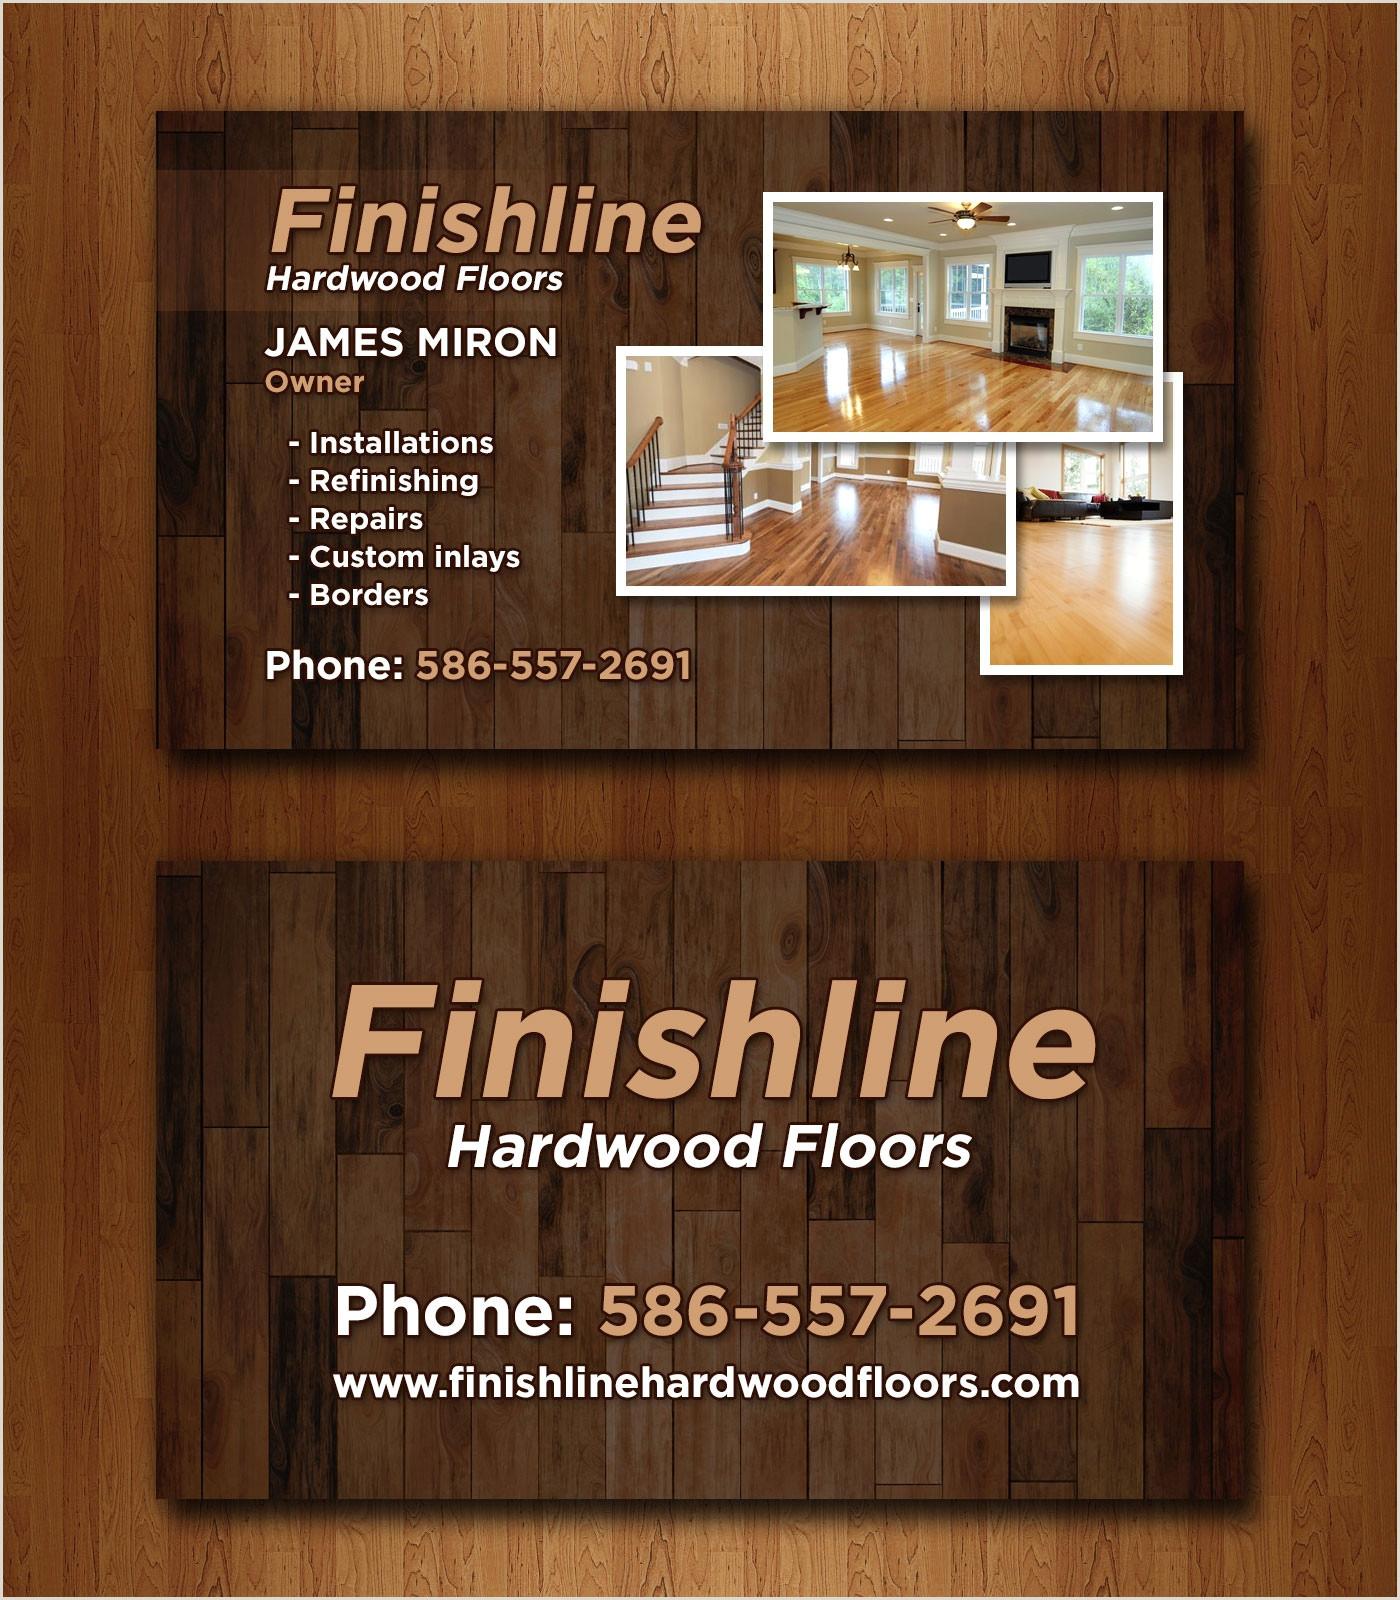 Stunning Business Cards 14 Popular Hardwood Flooring Business Card Template